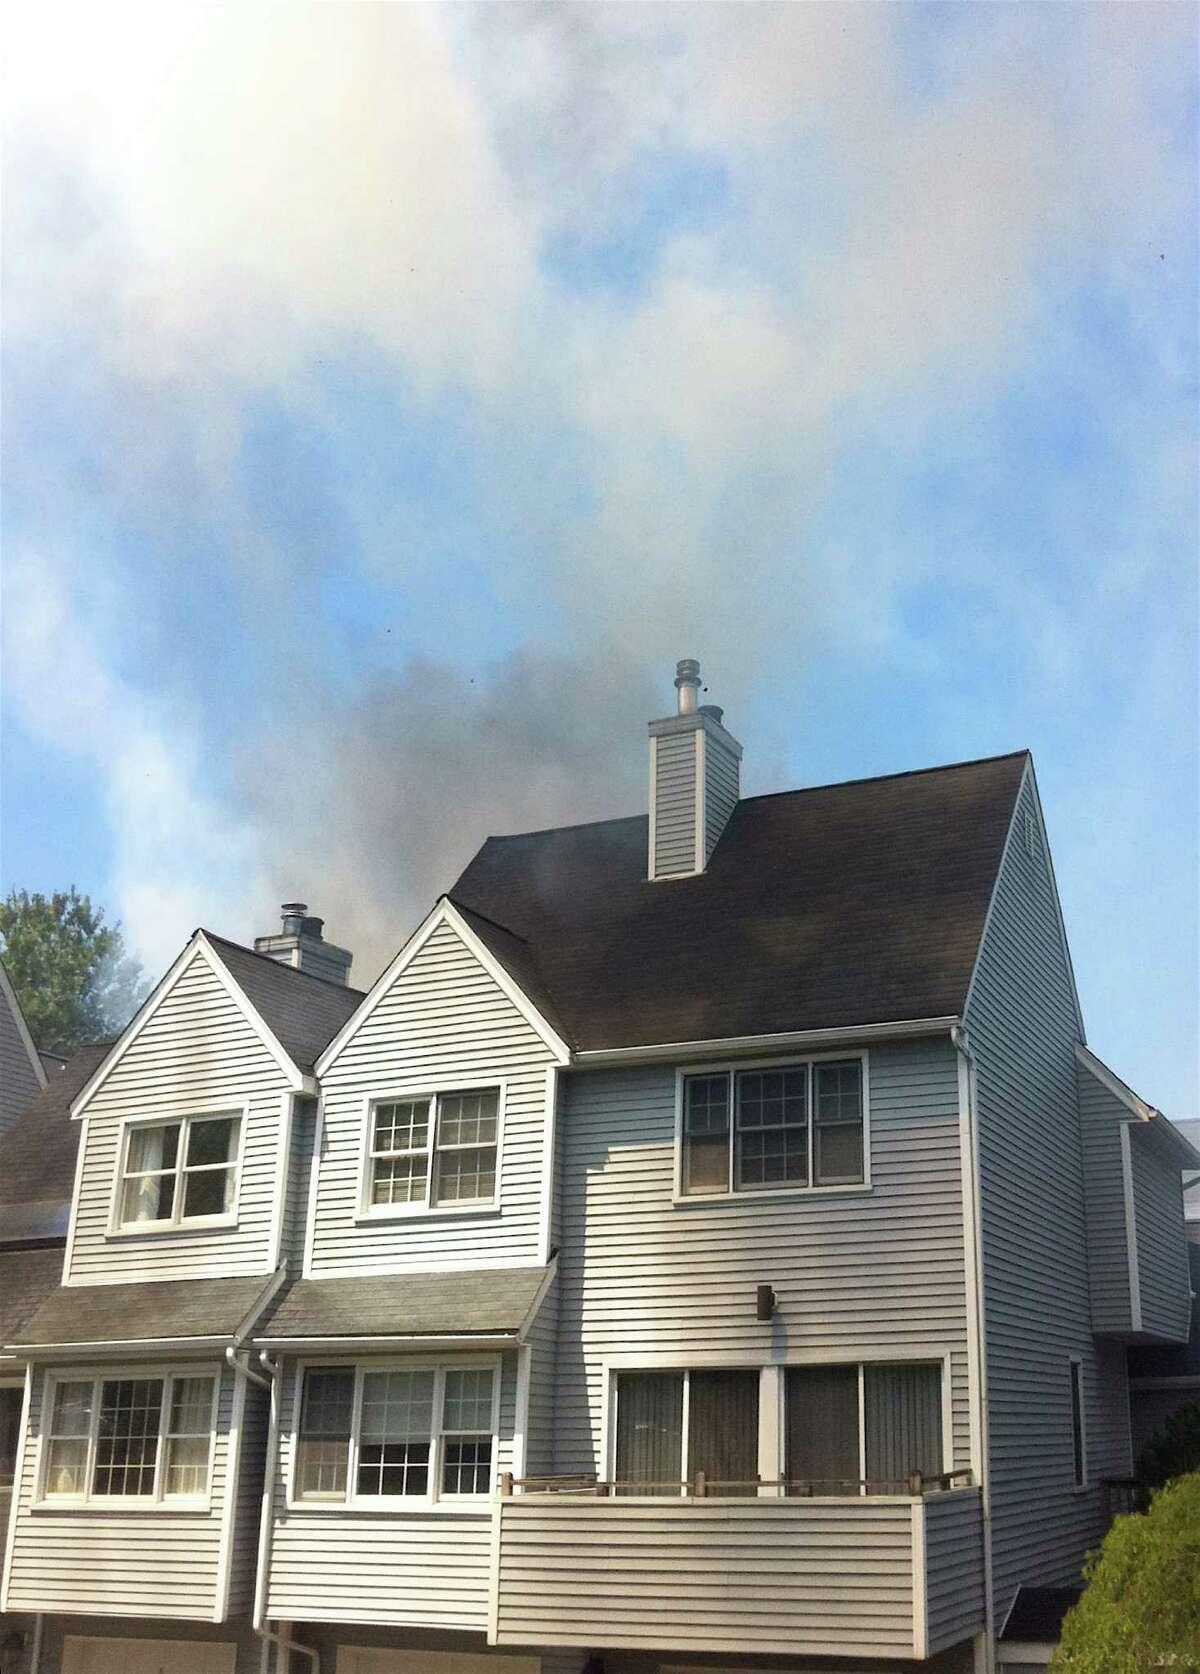 Smoke billows at a condo fire on Wilton Crest Road in Wilton, Conn., Sunday, April 29, 2012.